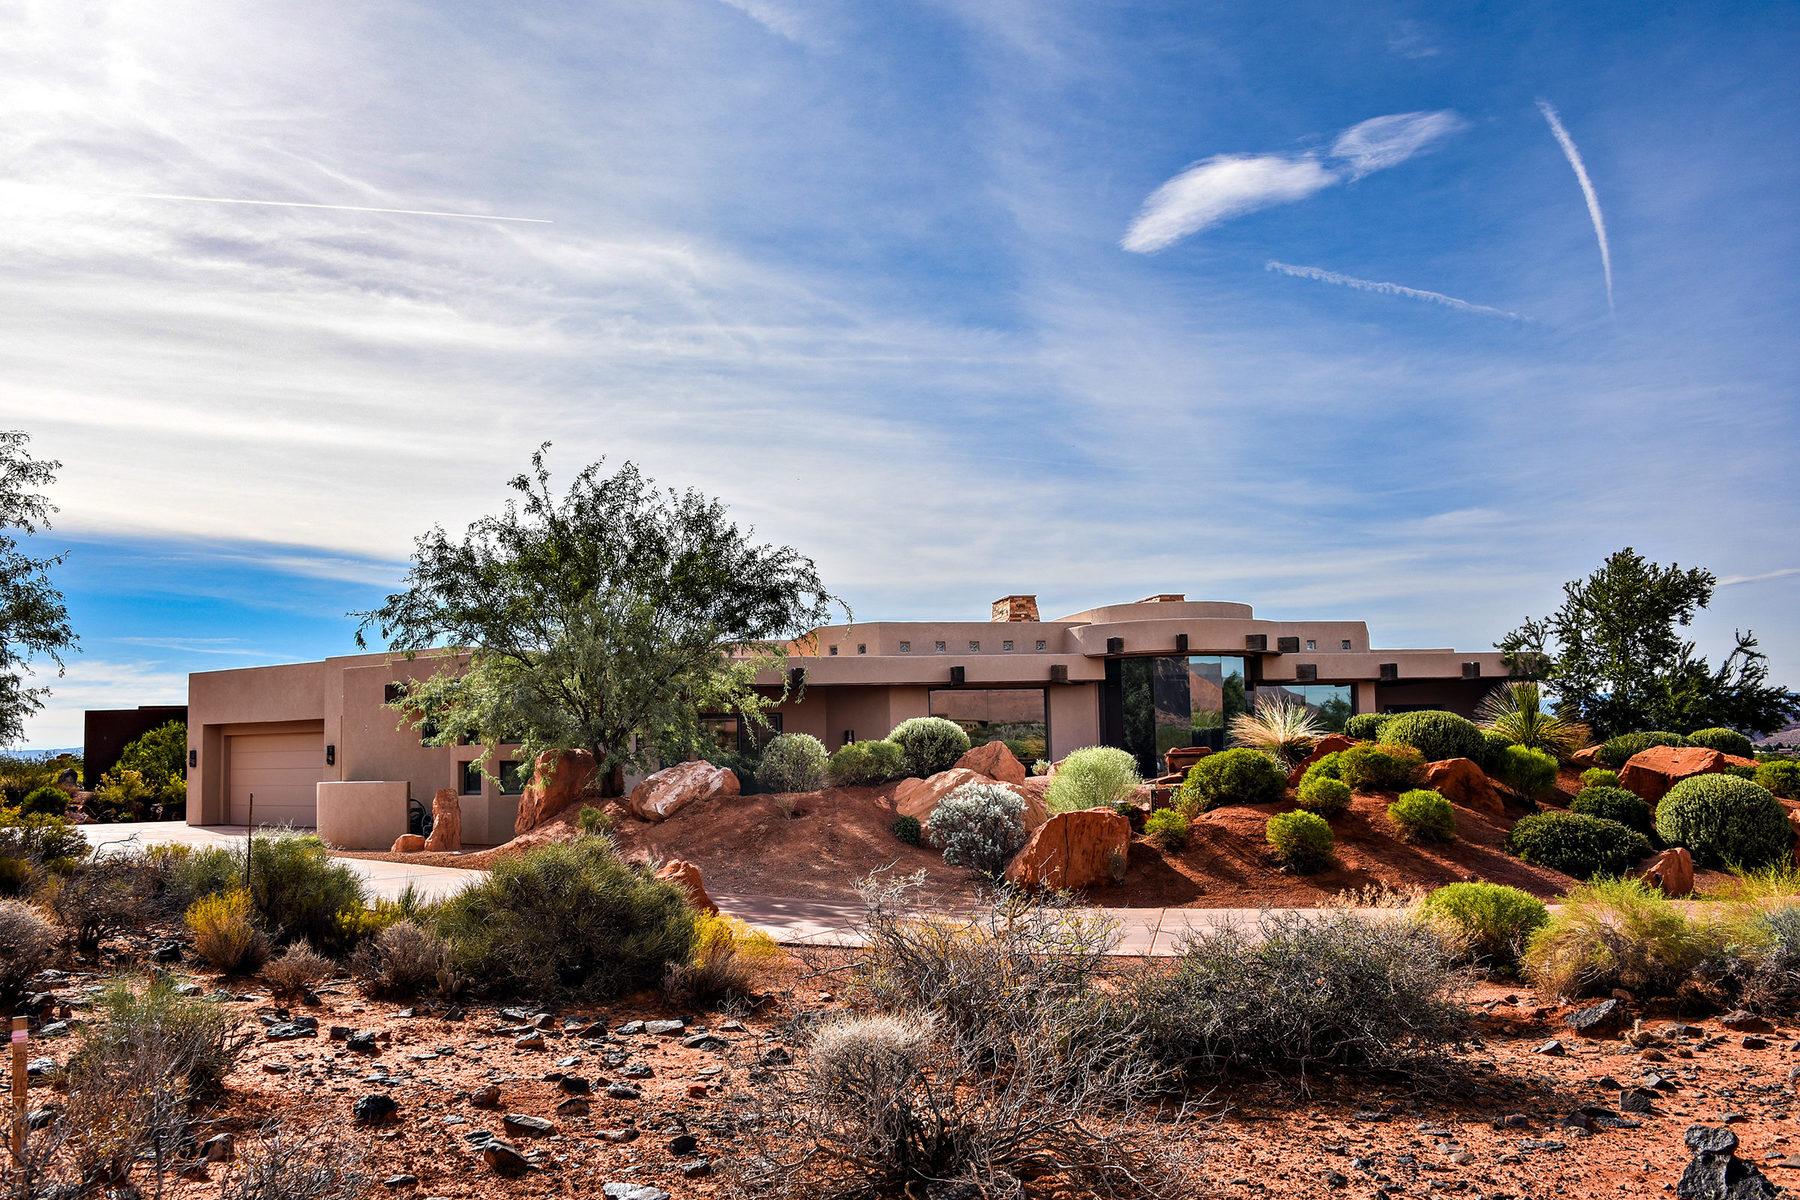 Single Family Home for Sale at Gorgeous Custom Estate Home 2484 Moenavi Circle St. George, Utah, 84770 United States